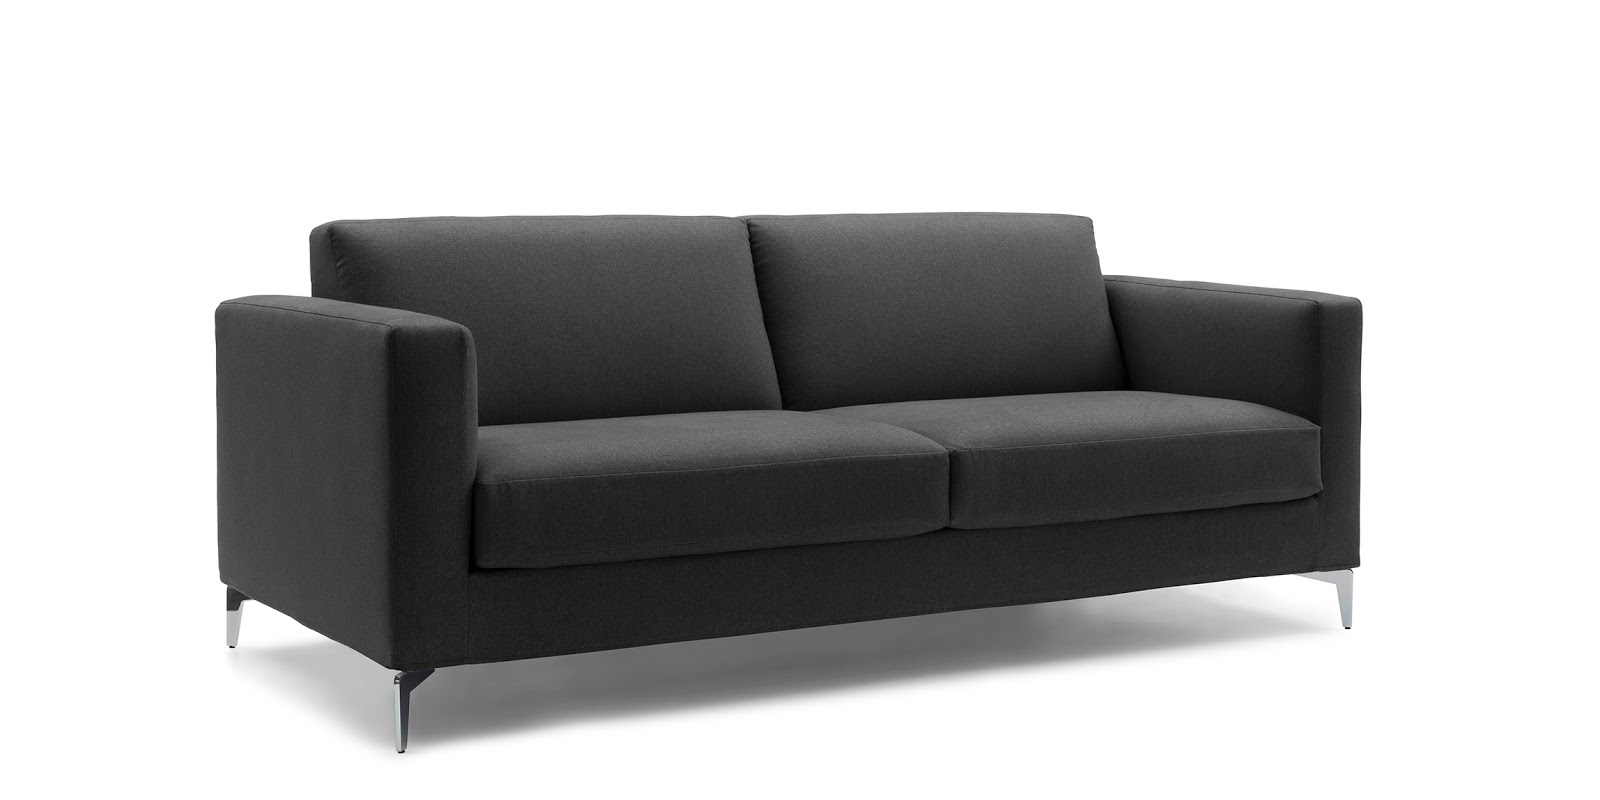 Latest Italian Sofa Designs Berkline Sectional Reviews Momentoitalia Furniture Blog News From The 2016